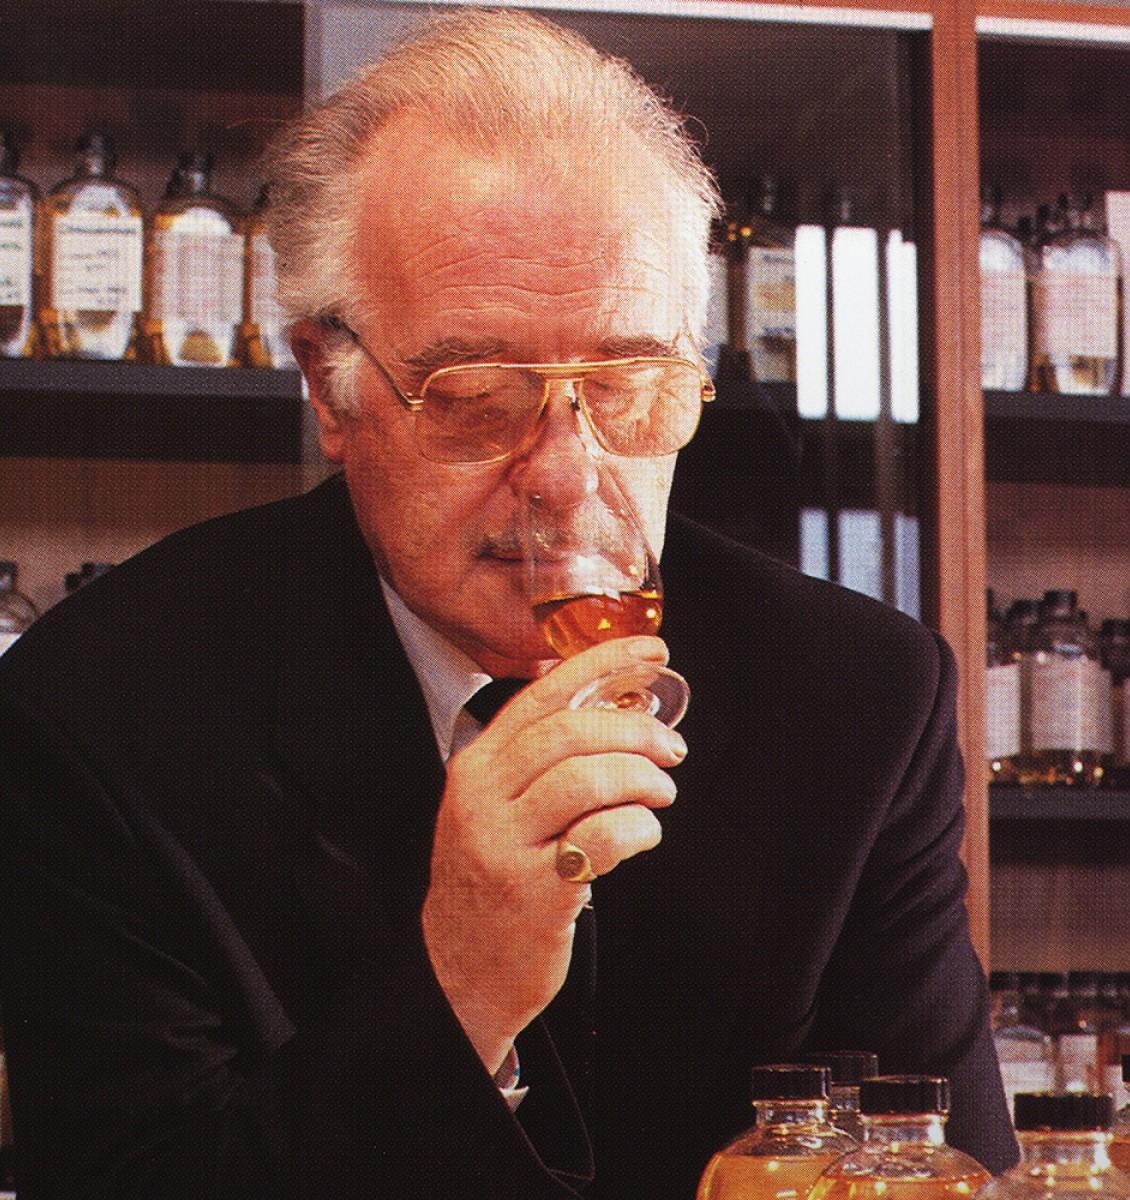 Ballantine's Master Blender Jack Goudy